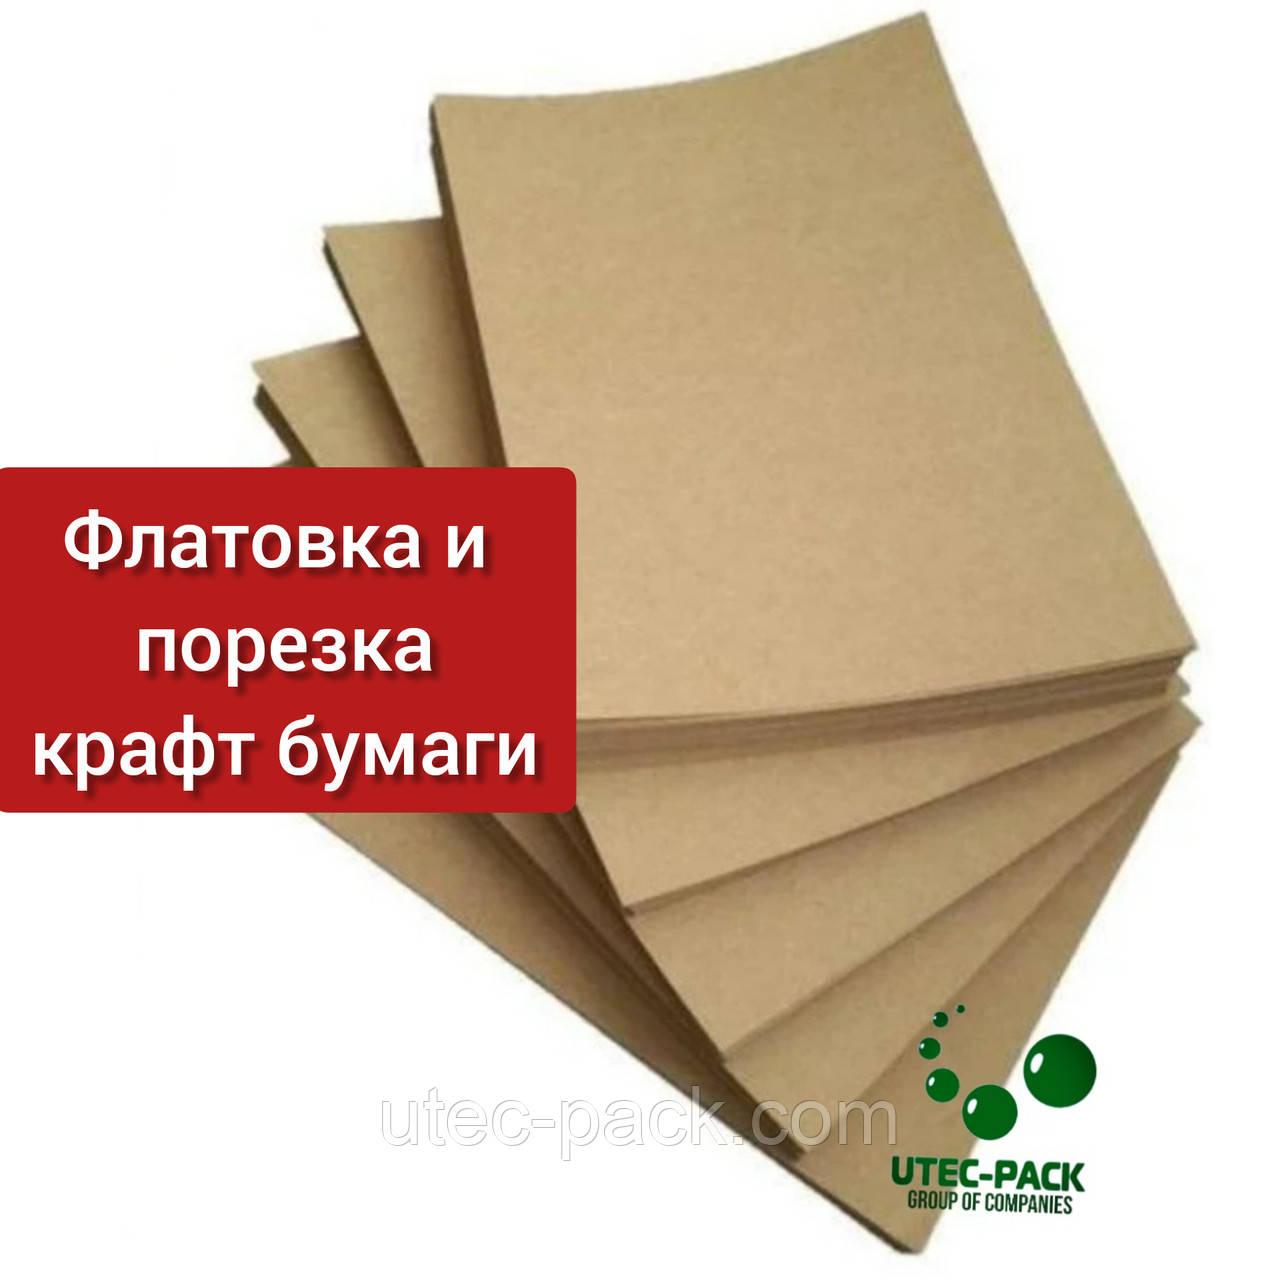 Порезка бумаги